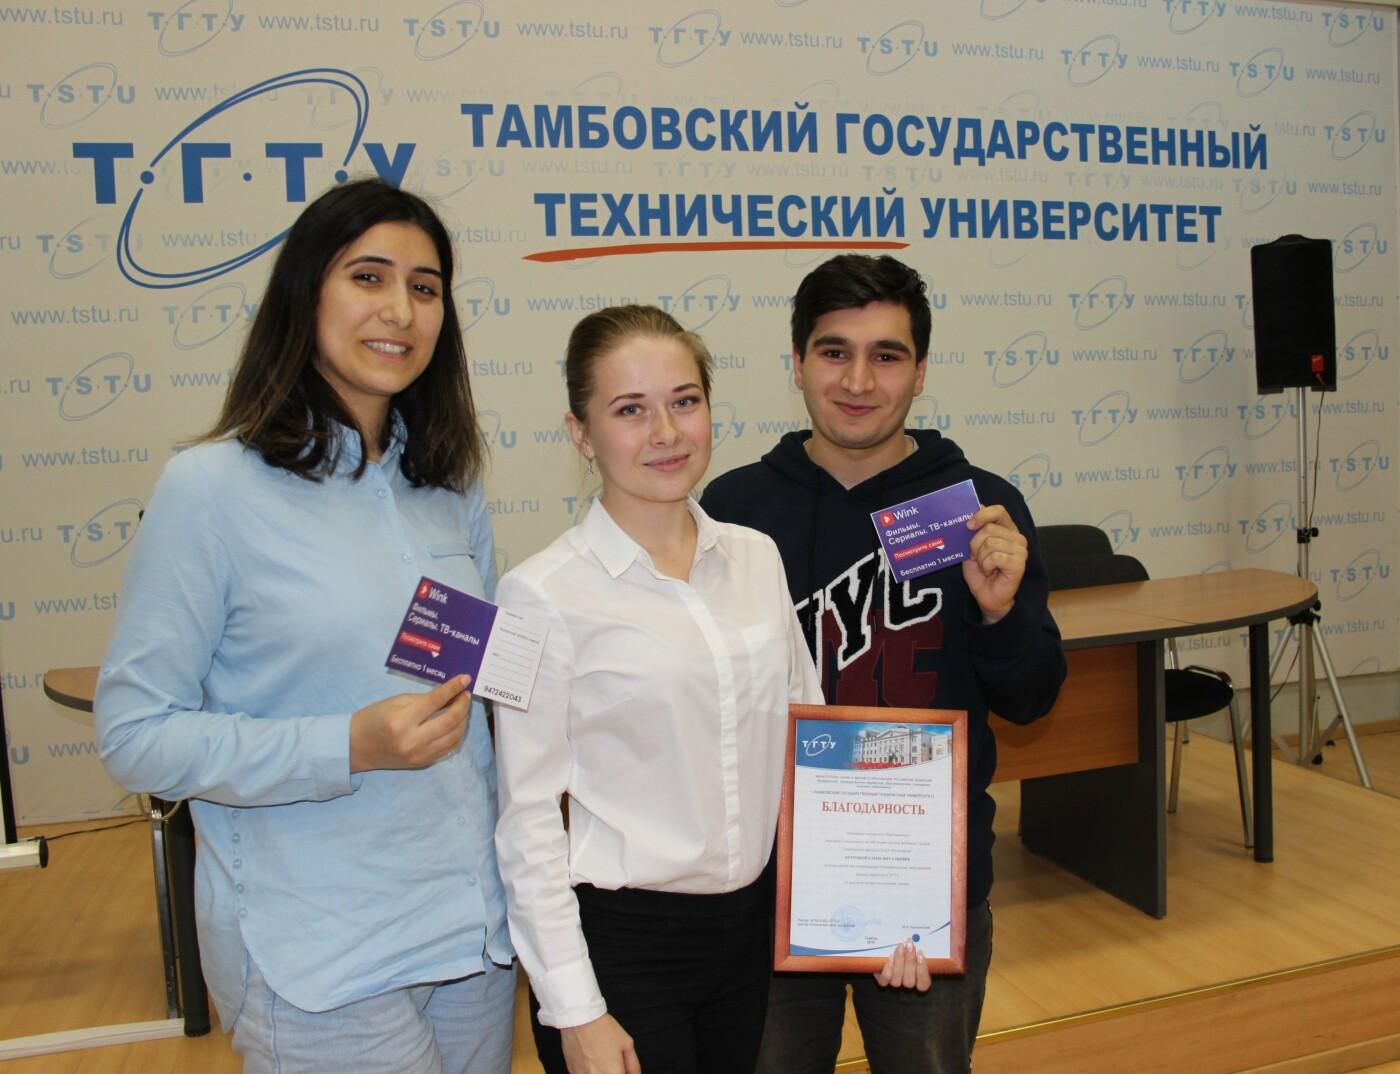 «Ростелеком» поддержал «Школу маркетинга» в Тамбове, фото-1